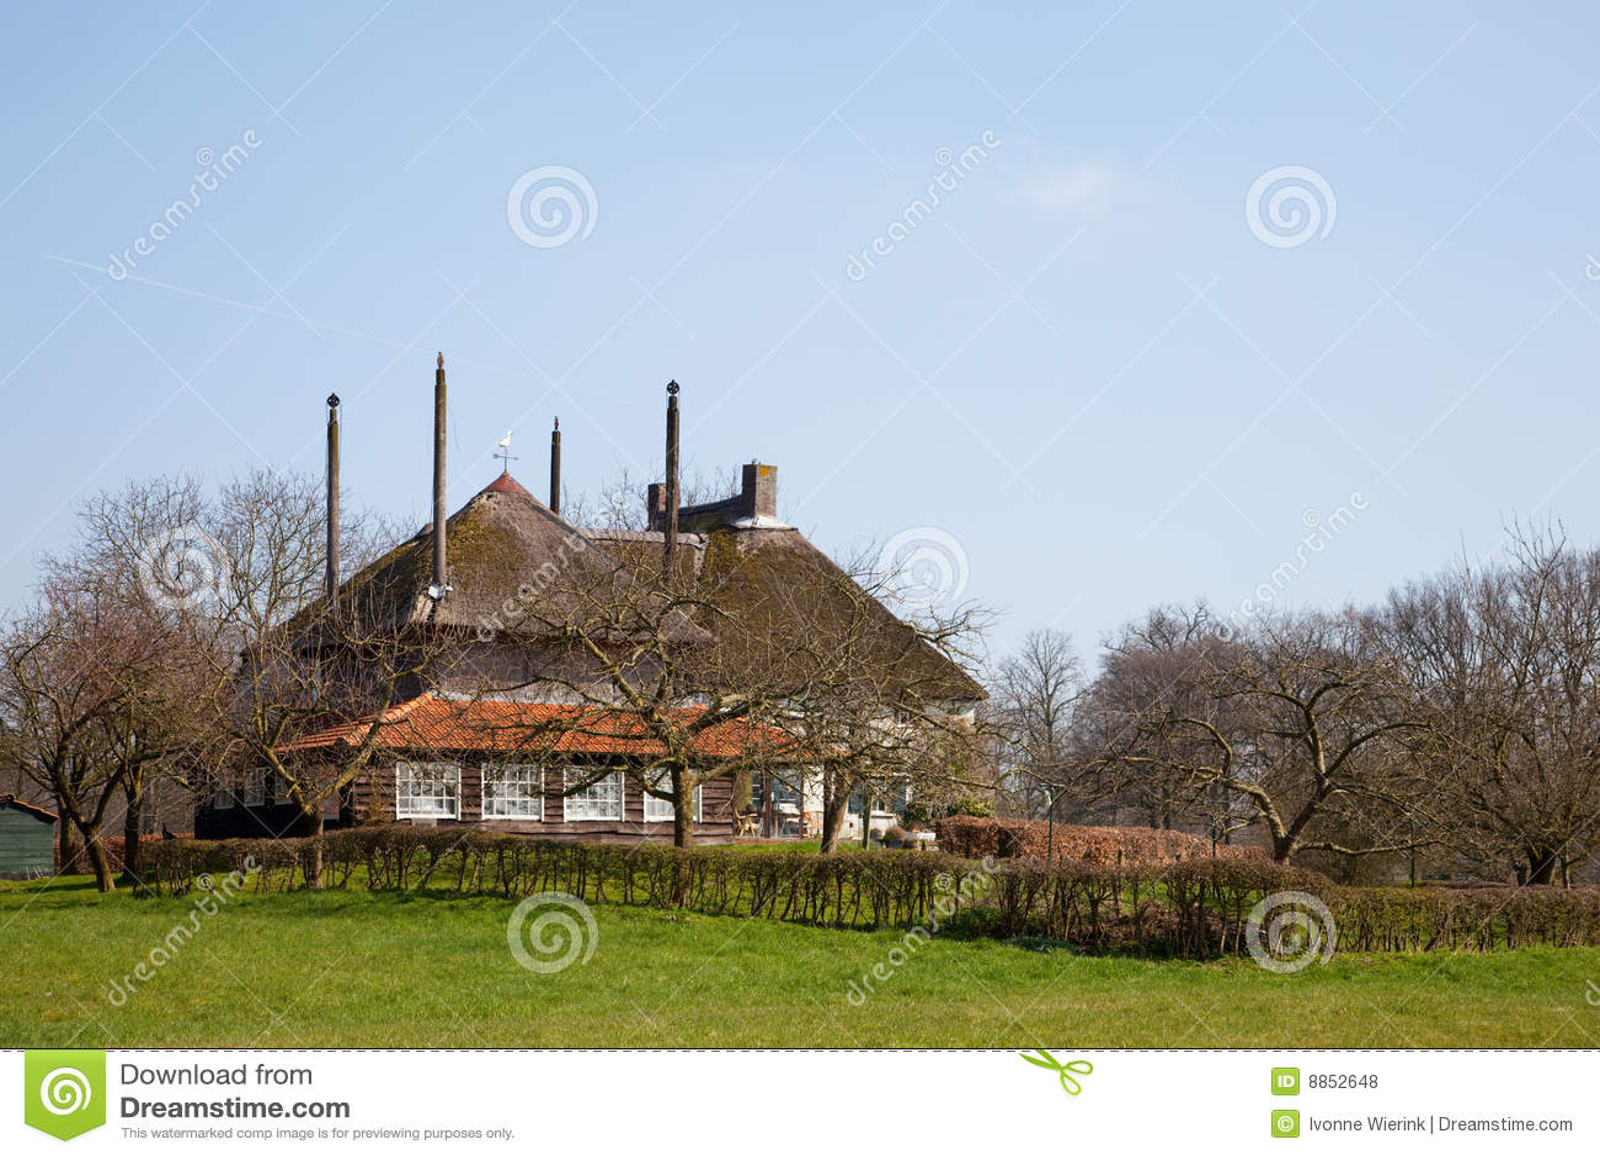 Farmhouse in dutch landscape royalty free stock photos for Farm house netherlands